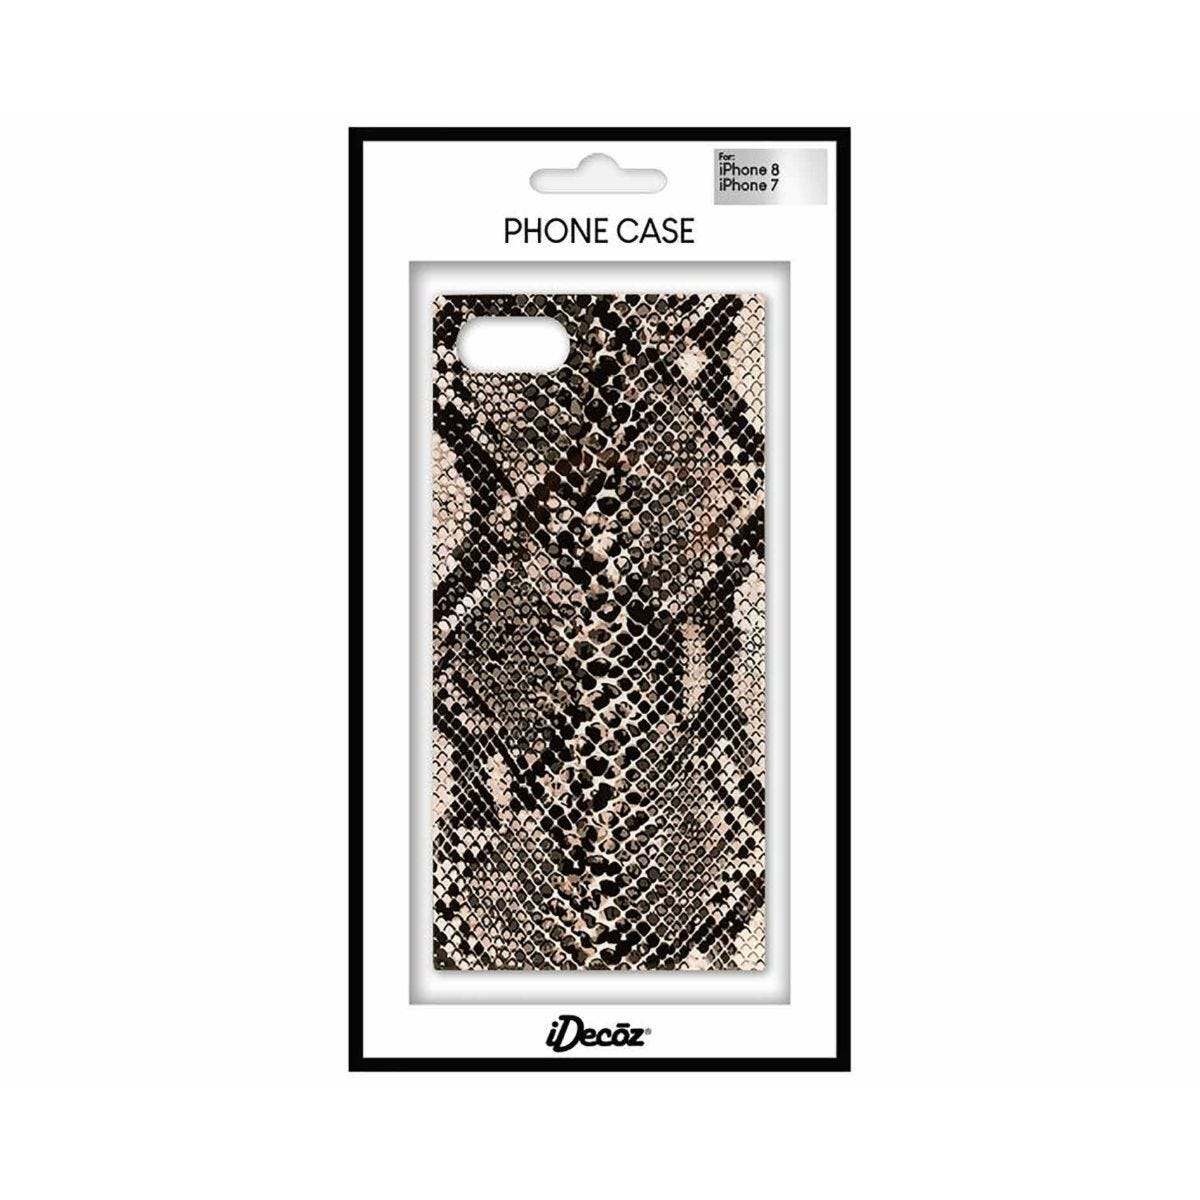 iDecoz iPhone 7/8 Protective Case Snake Print